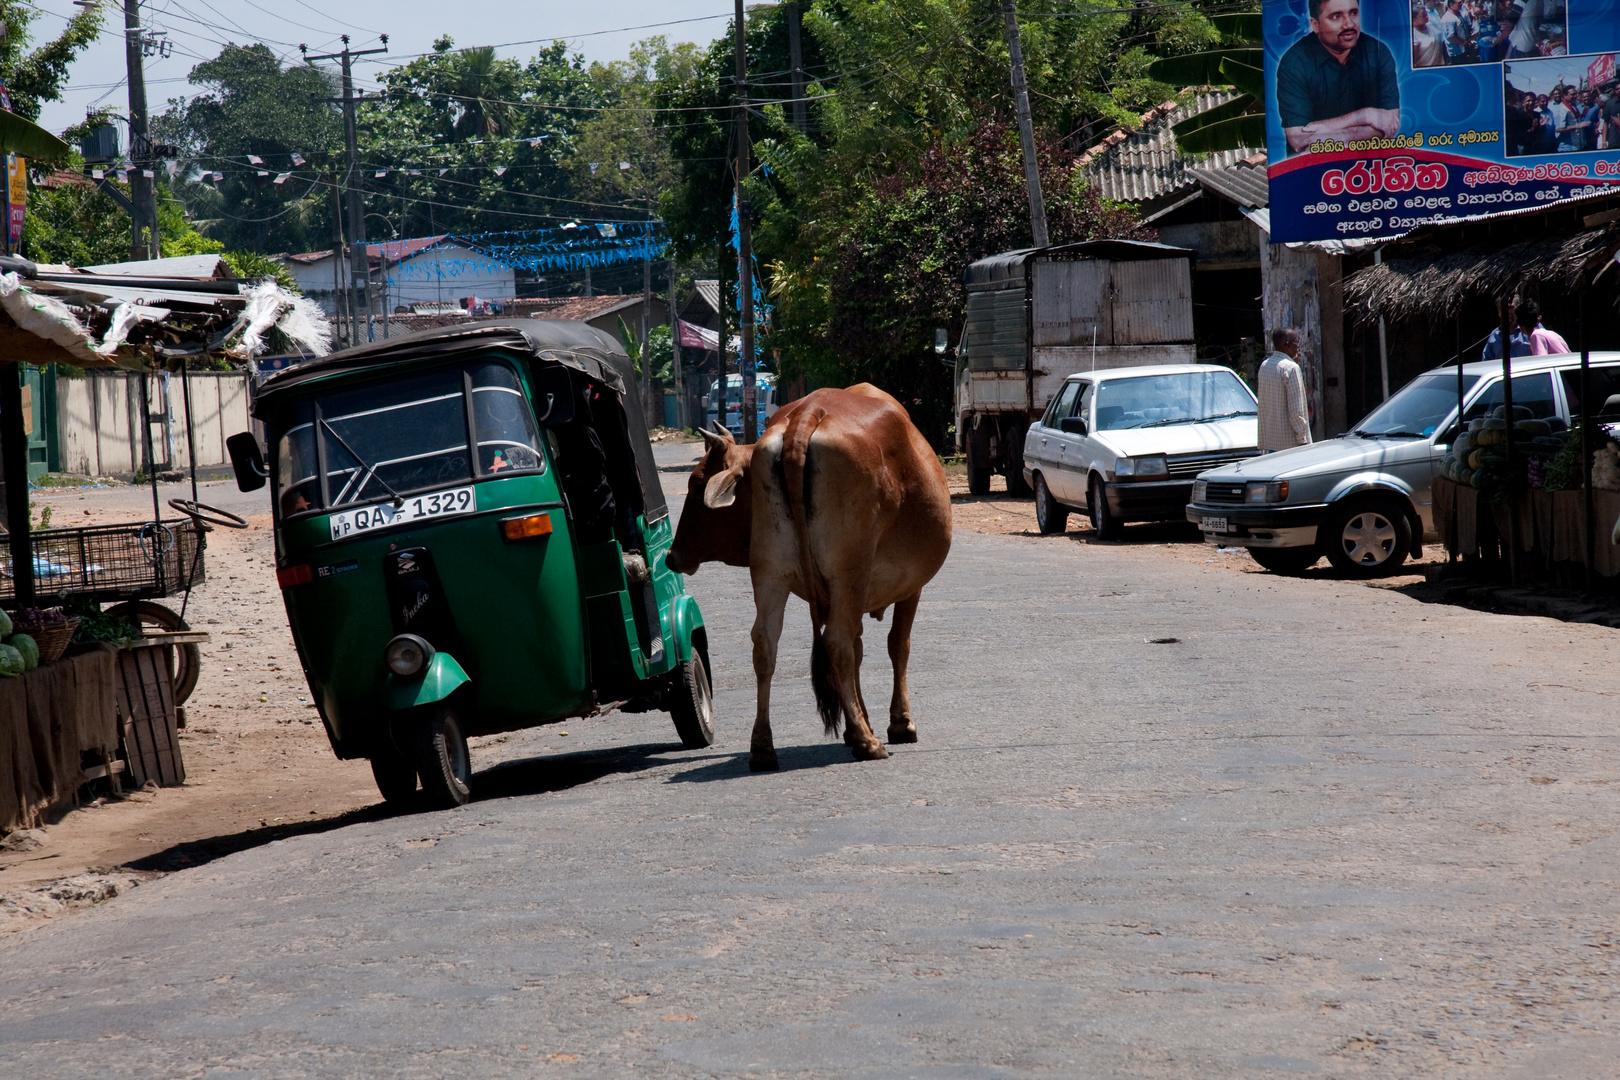 Strassenverkehr in Sri Lanka